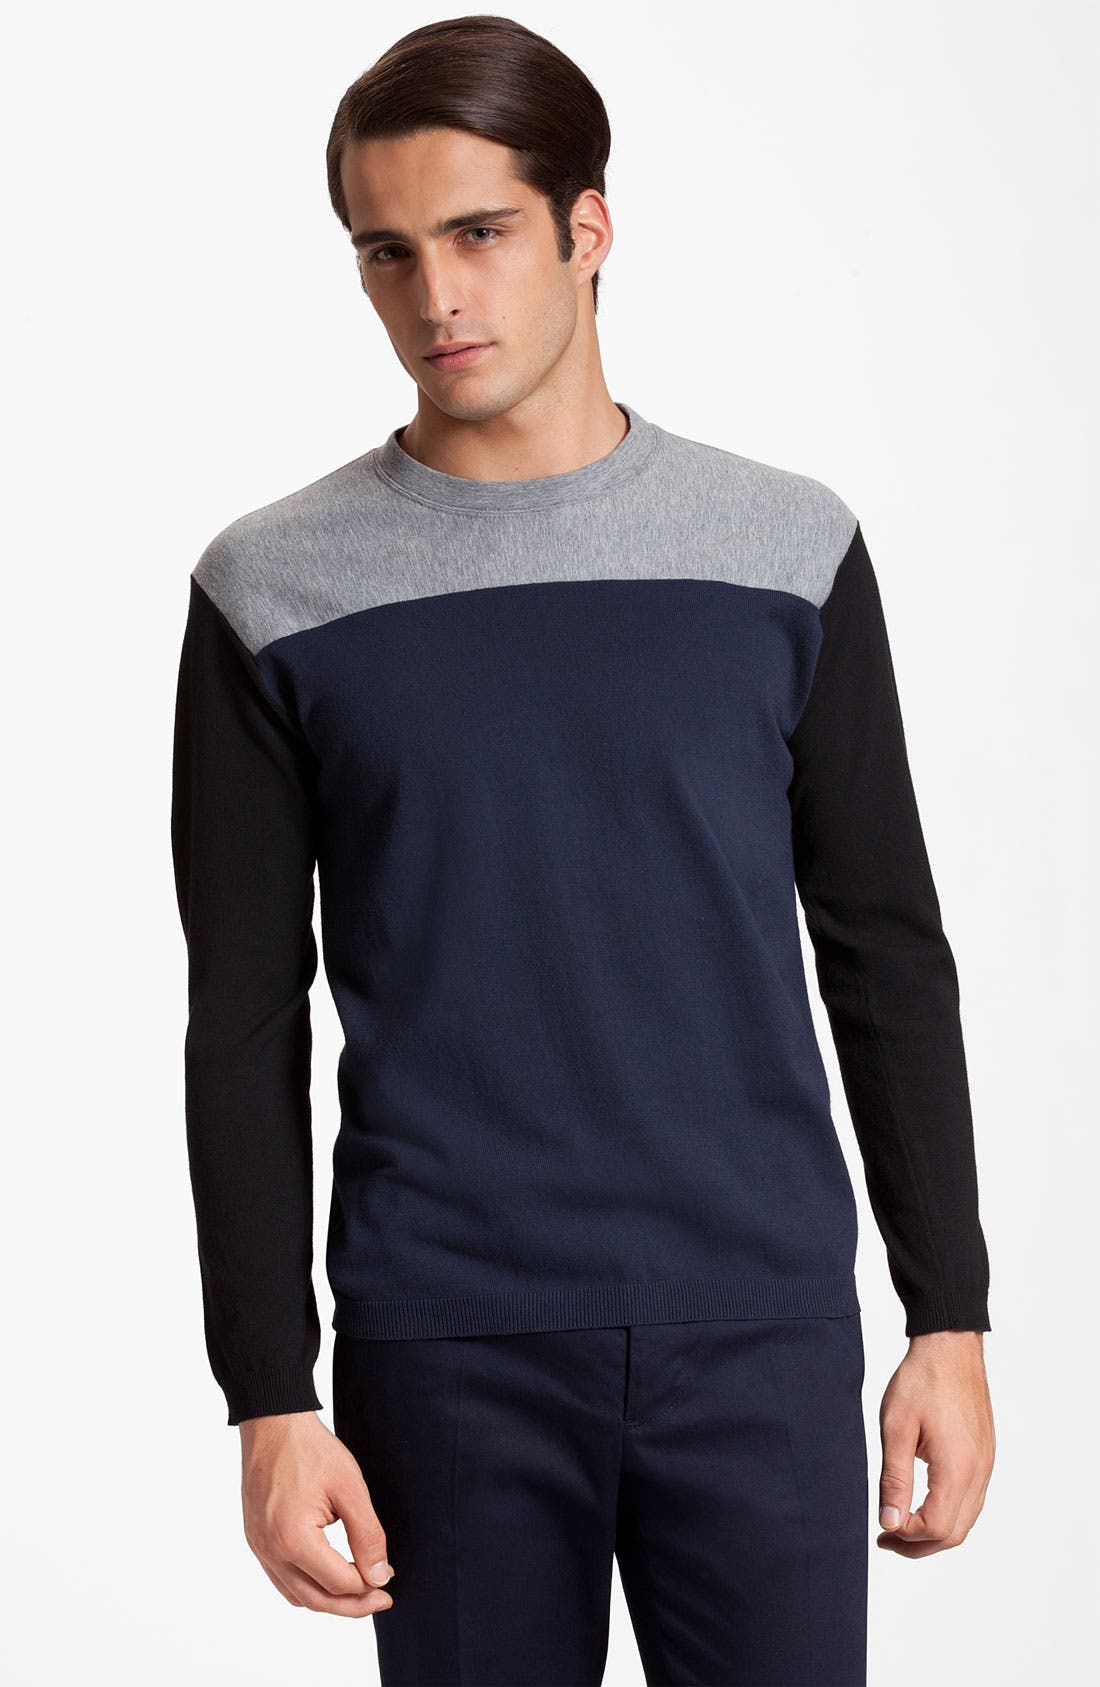 Alternate Image 1 Selected - Marni Colorblock Crewneck Sweater